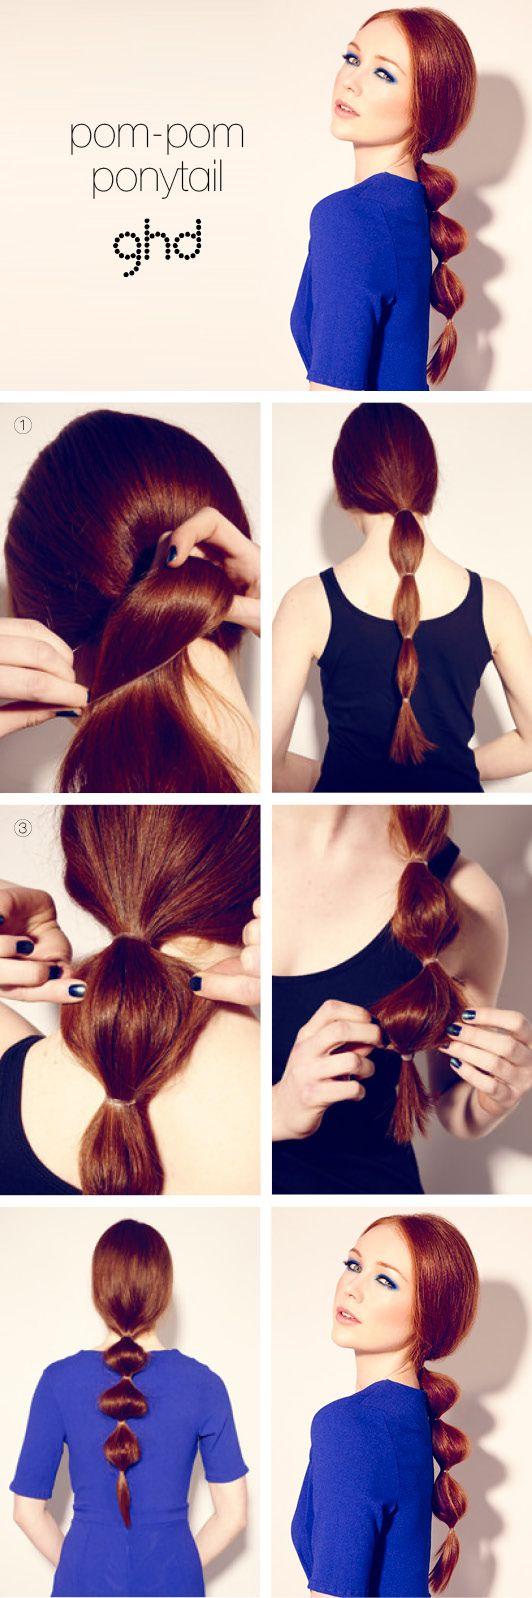 How to hairstyles pom pom ponytail  GUIDA STEP-BY-STEP: POM POM PONYTAIL  Rendi più POP la tua coda! Dona ai tuoi CAPELLI un look FASHION-TWIST con queste semplici mosse.